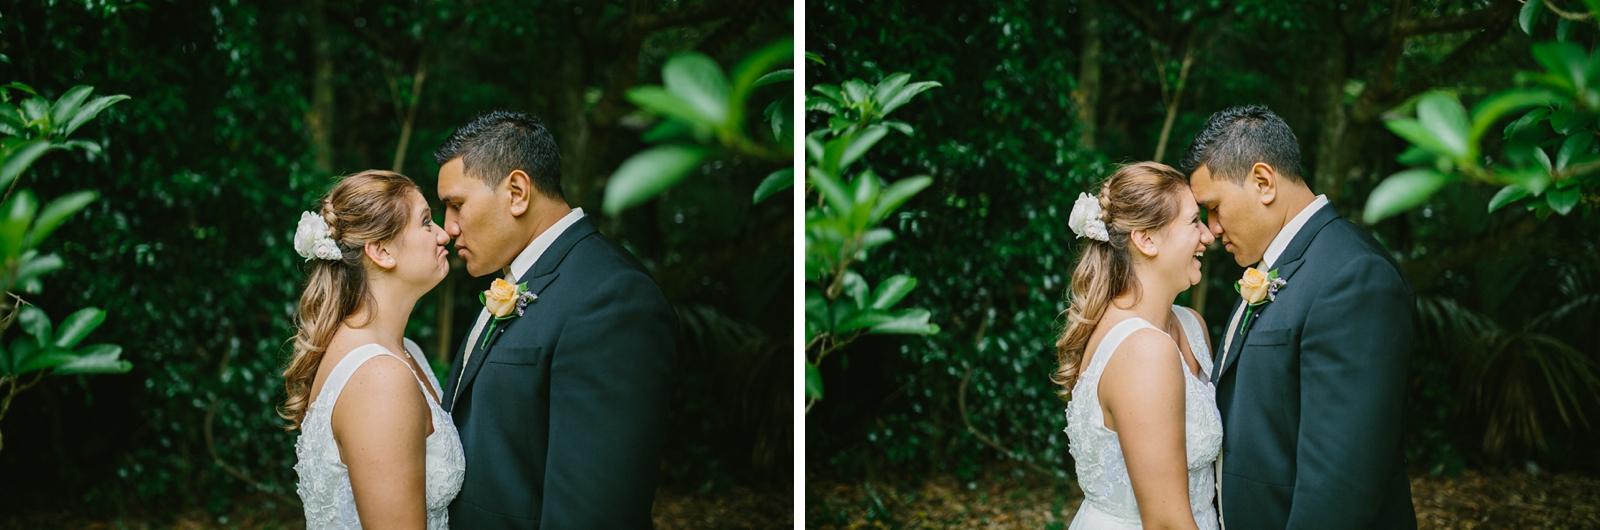 GabbyFiti_Auckland Wedding Photographer_Patty Lagera_0067.jpg